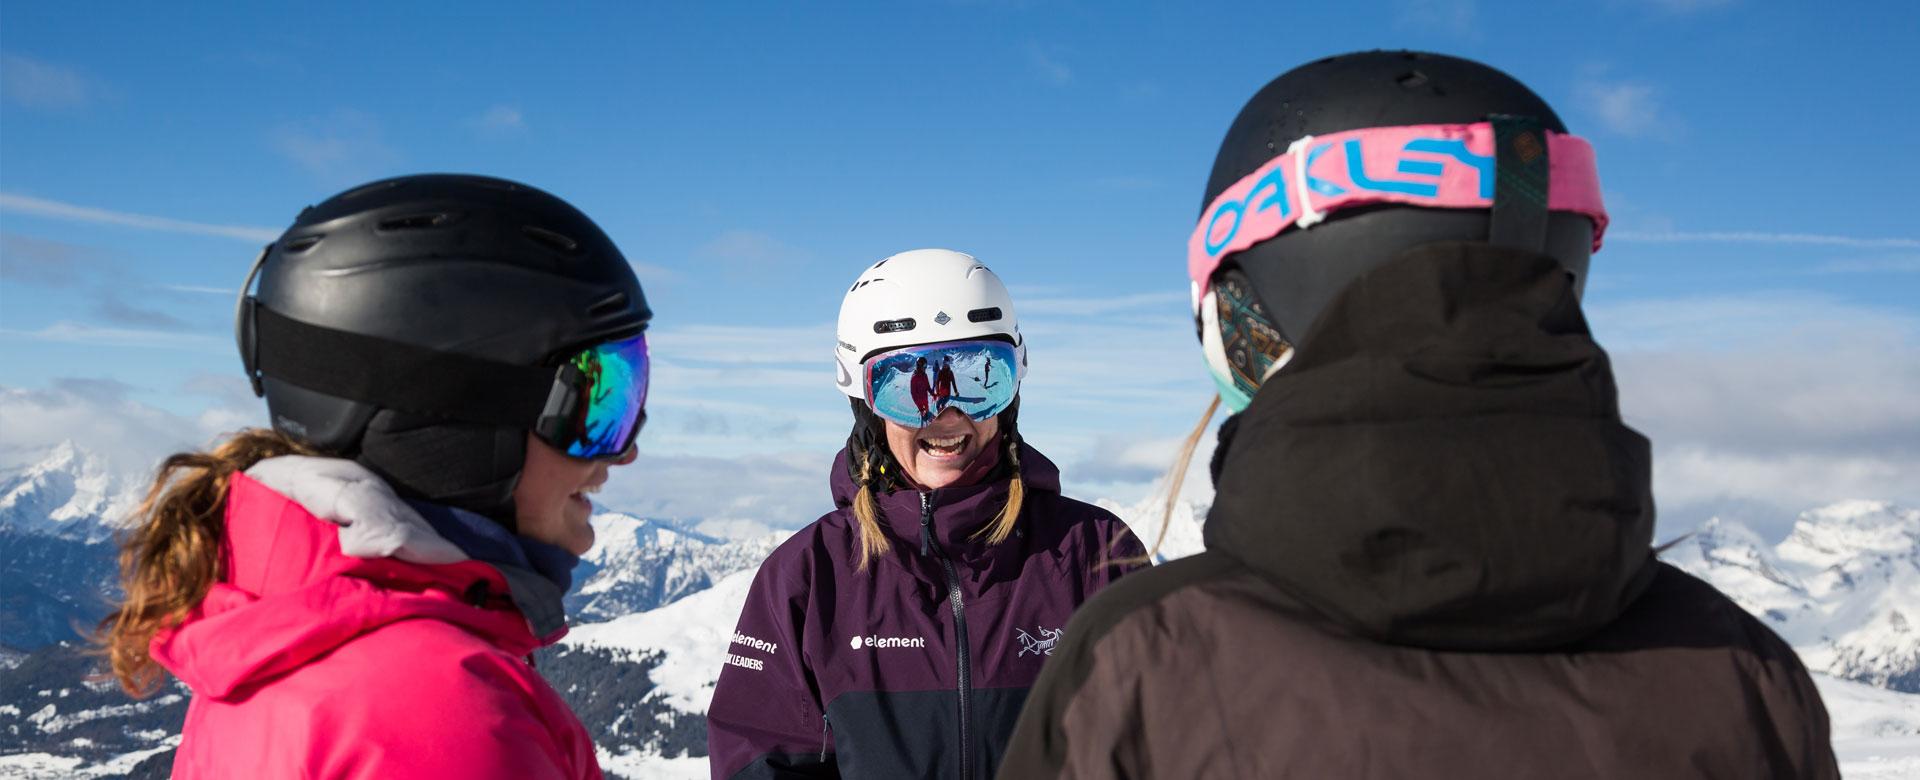 Working As A Ski Instructor Basi Ski Instructor Training Courses Peak Leaders